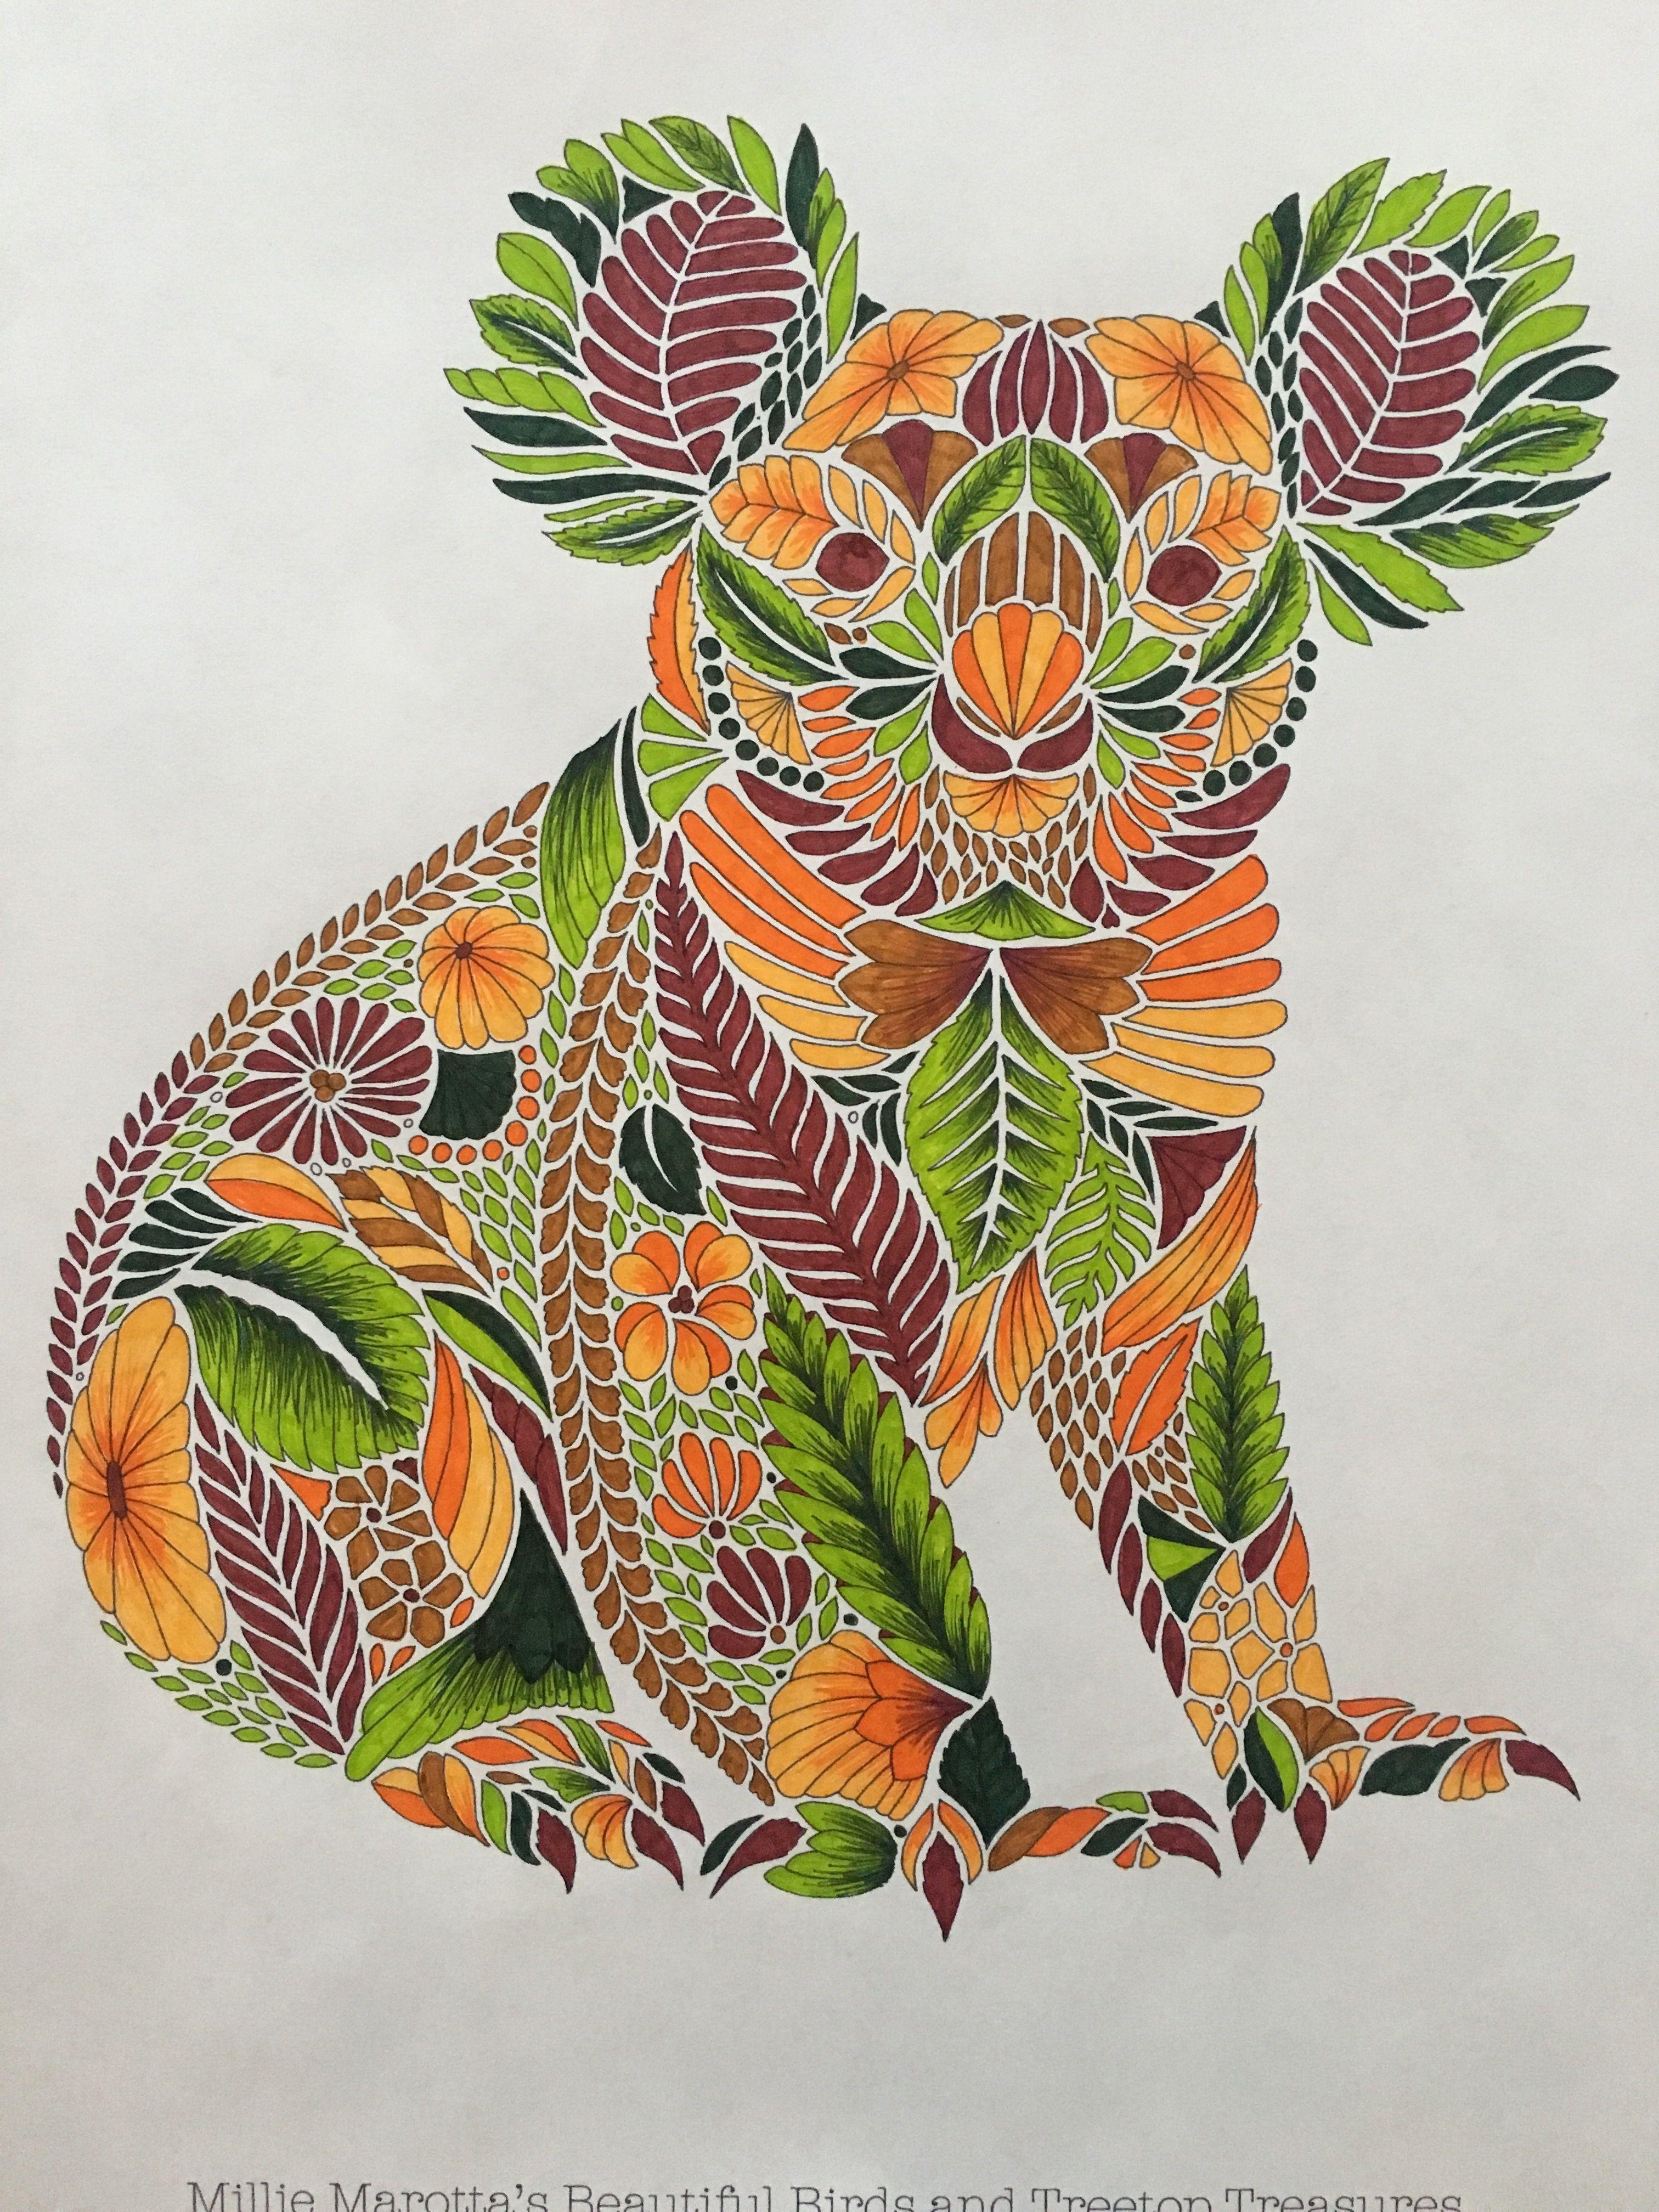 Mille Marotta Koala Coloring Animal Kingdom Colouring Book Millie Marotta Animal Kingdom Millie Marotta Coloring Book